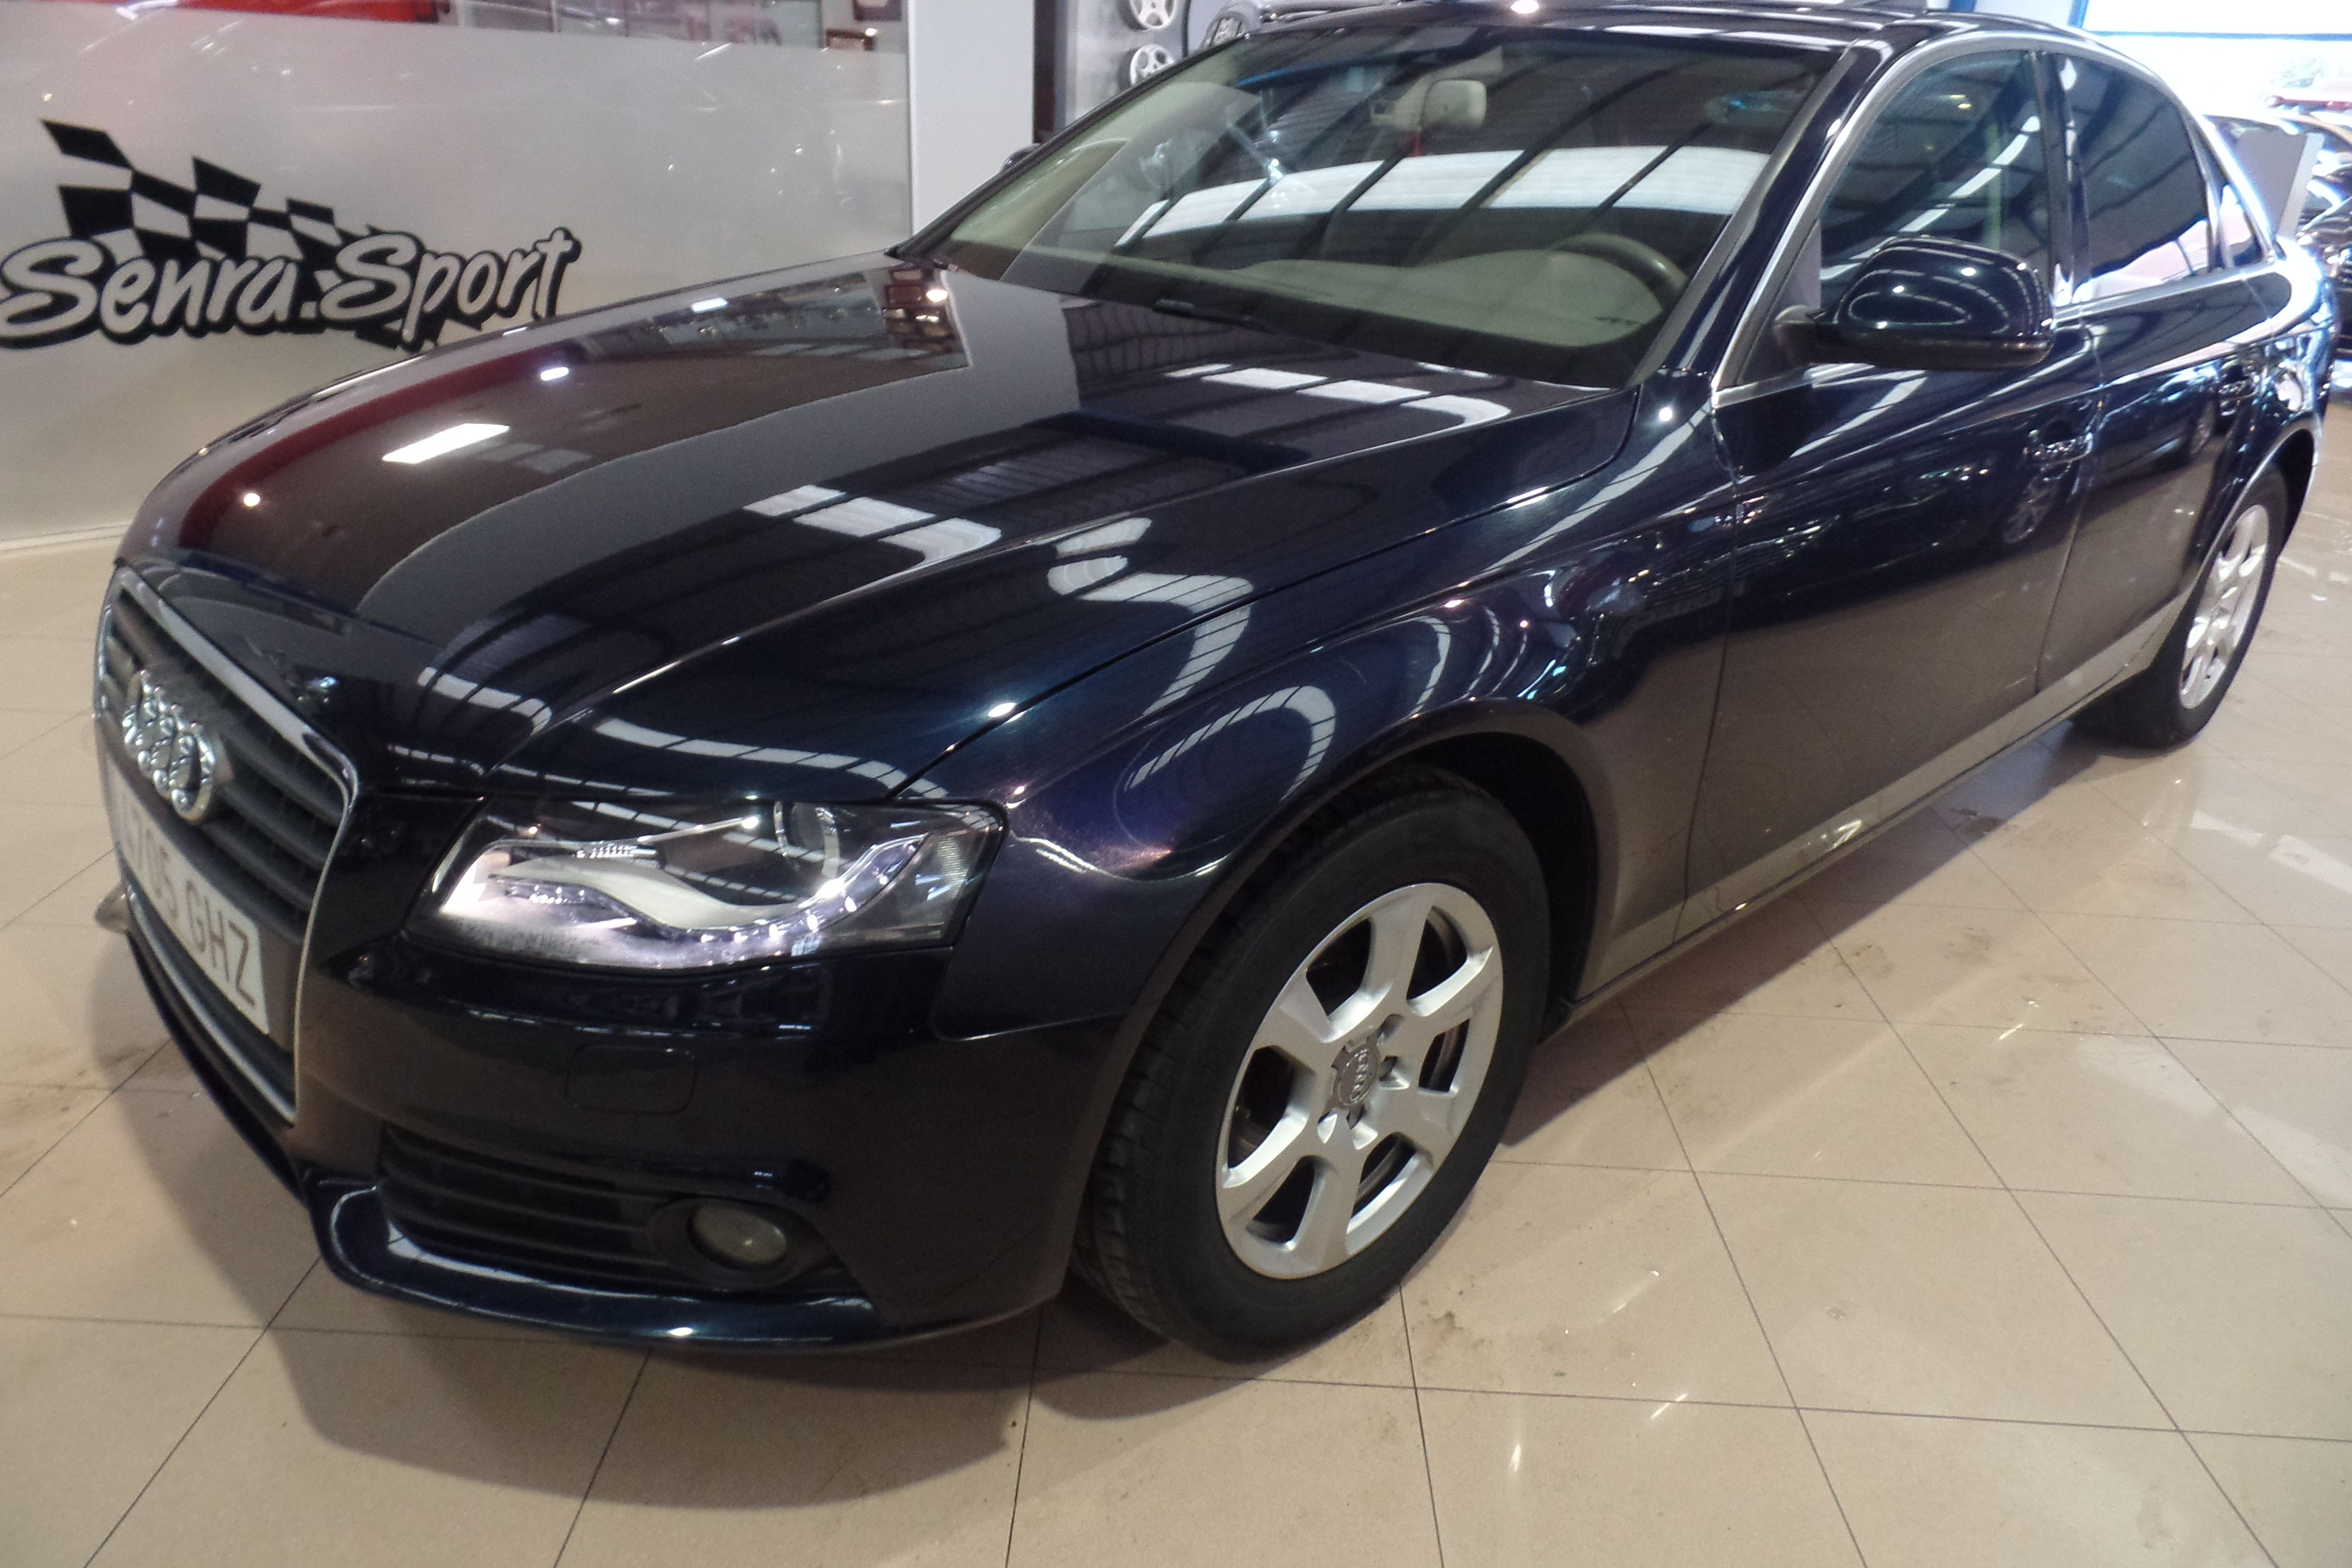 AUDI A4 2.0 TFSI 180cv (4705-GHZ): Servicios Peugeot de Senra Sport